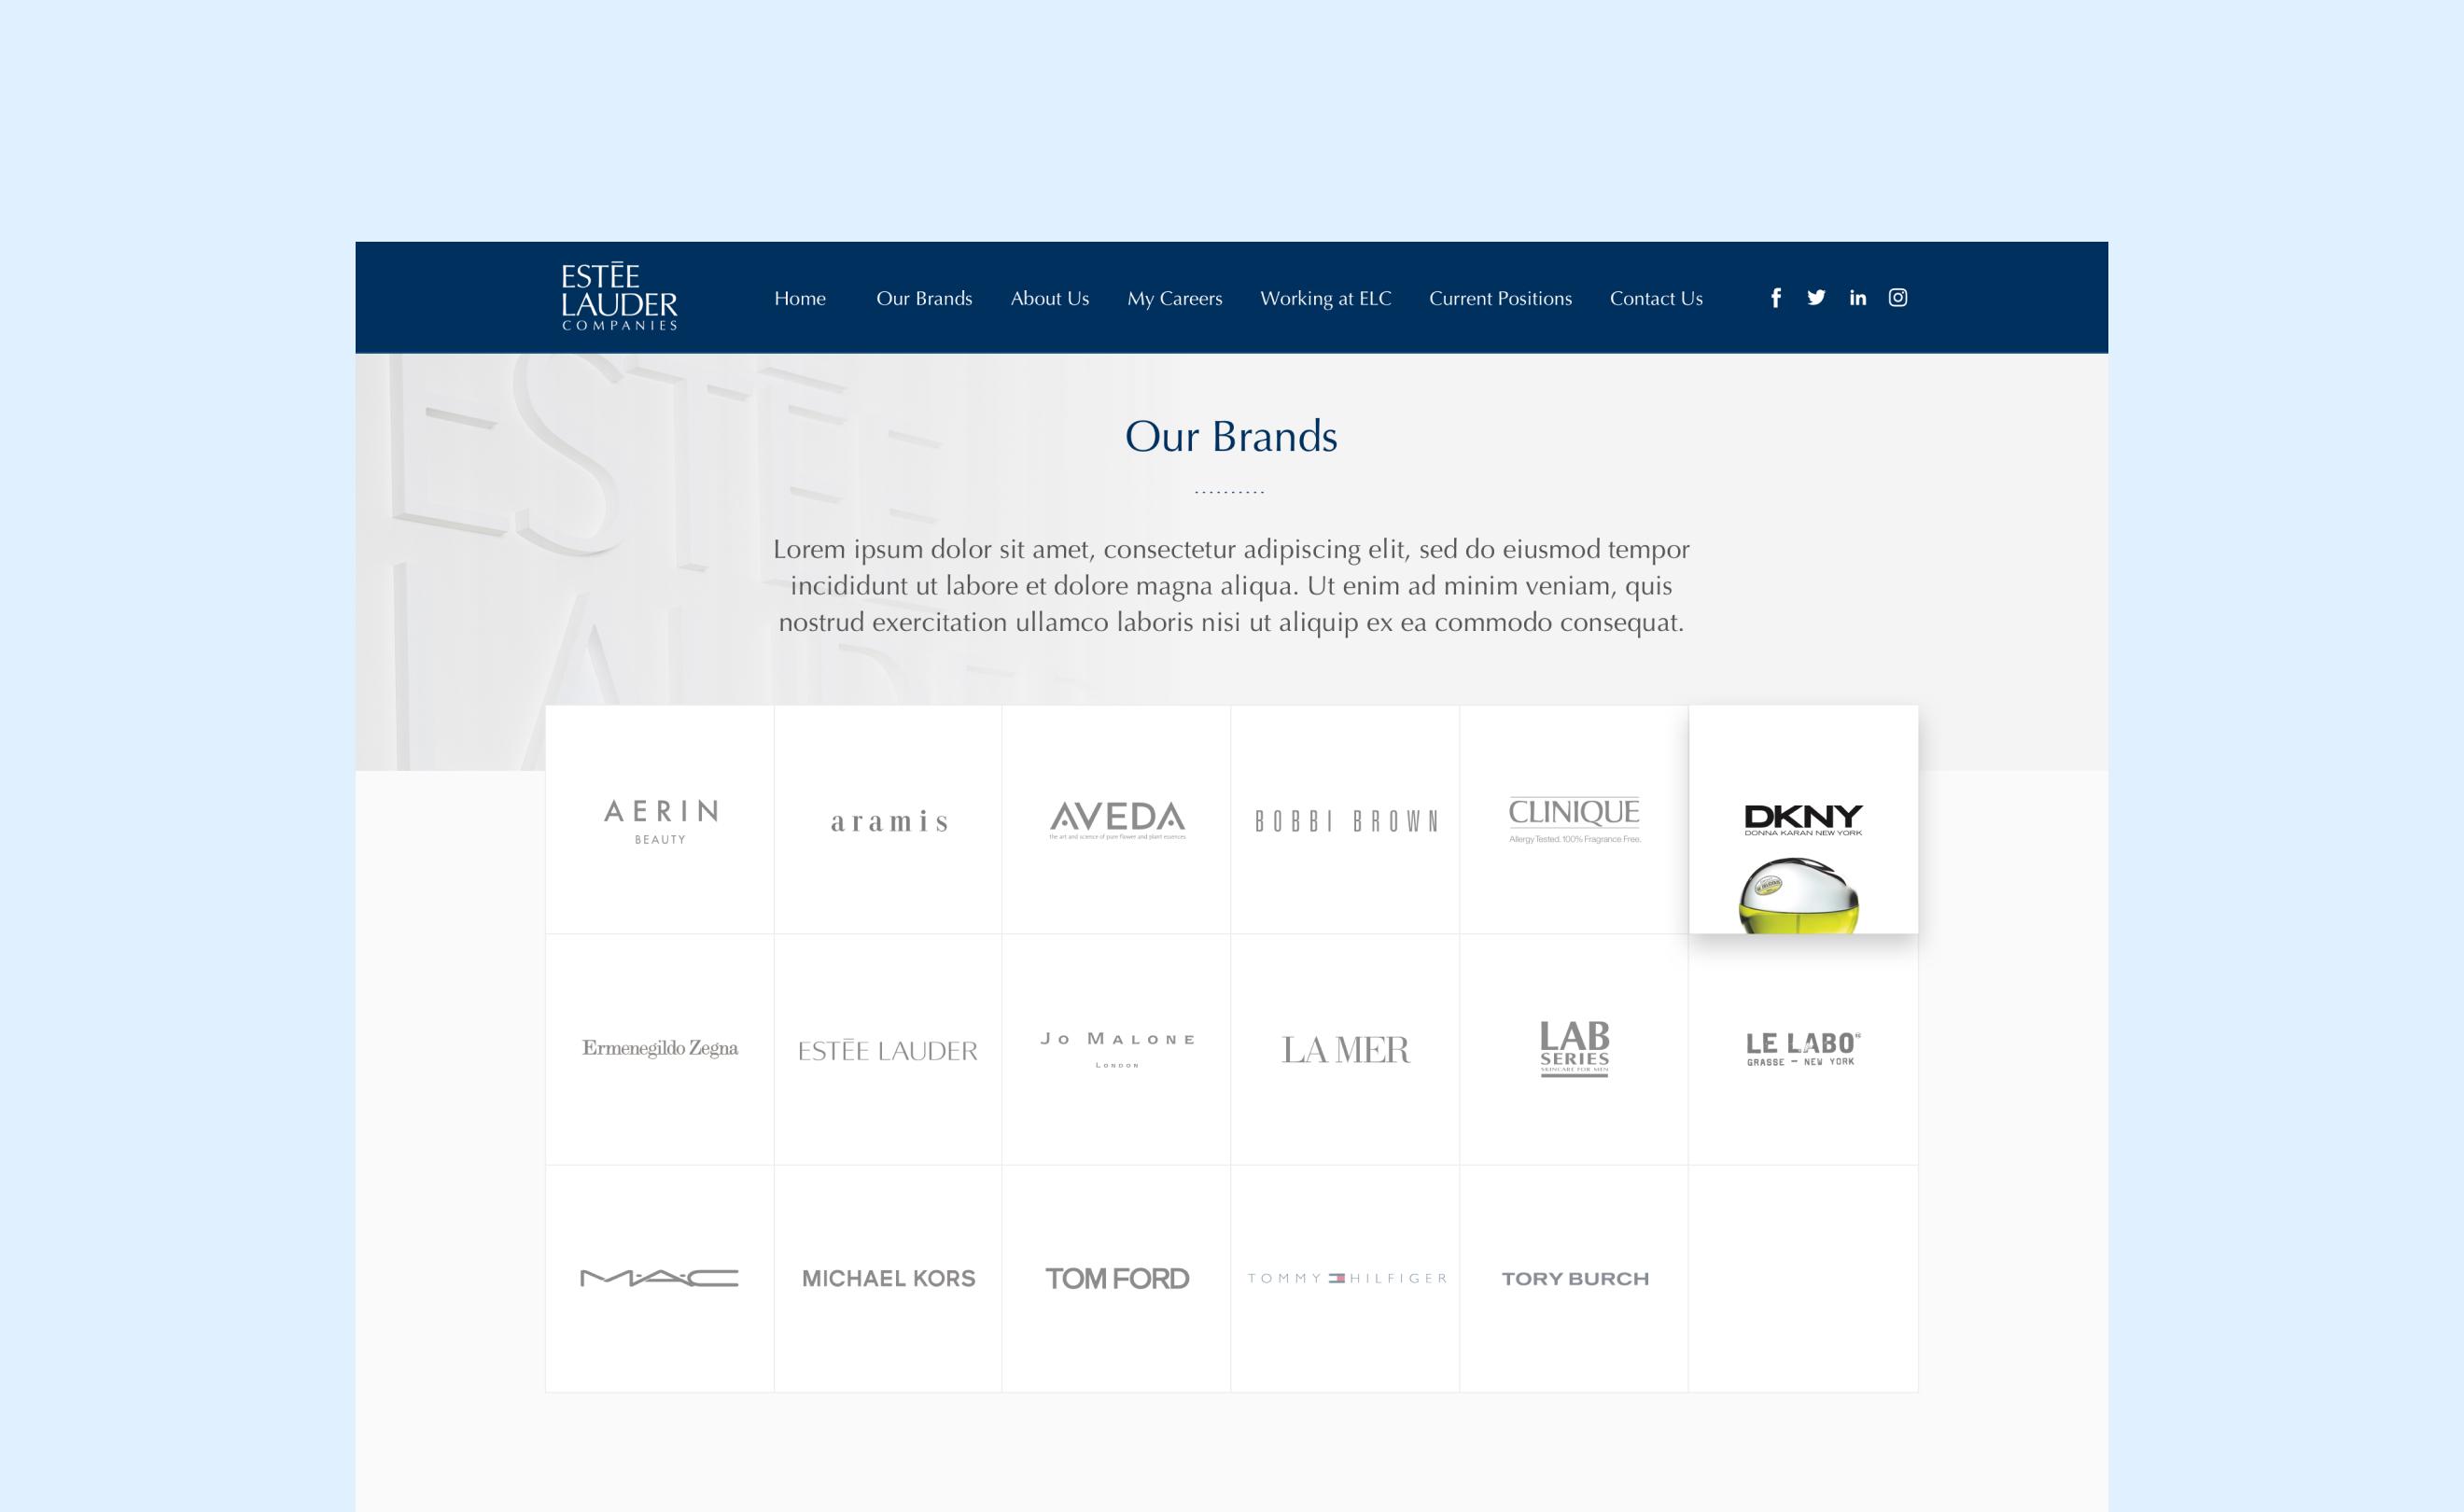 Estee Lauder Career – our brands